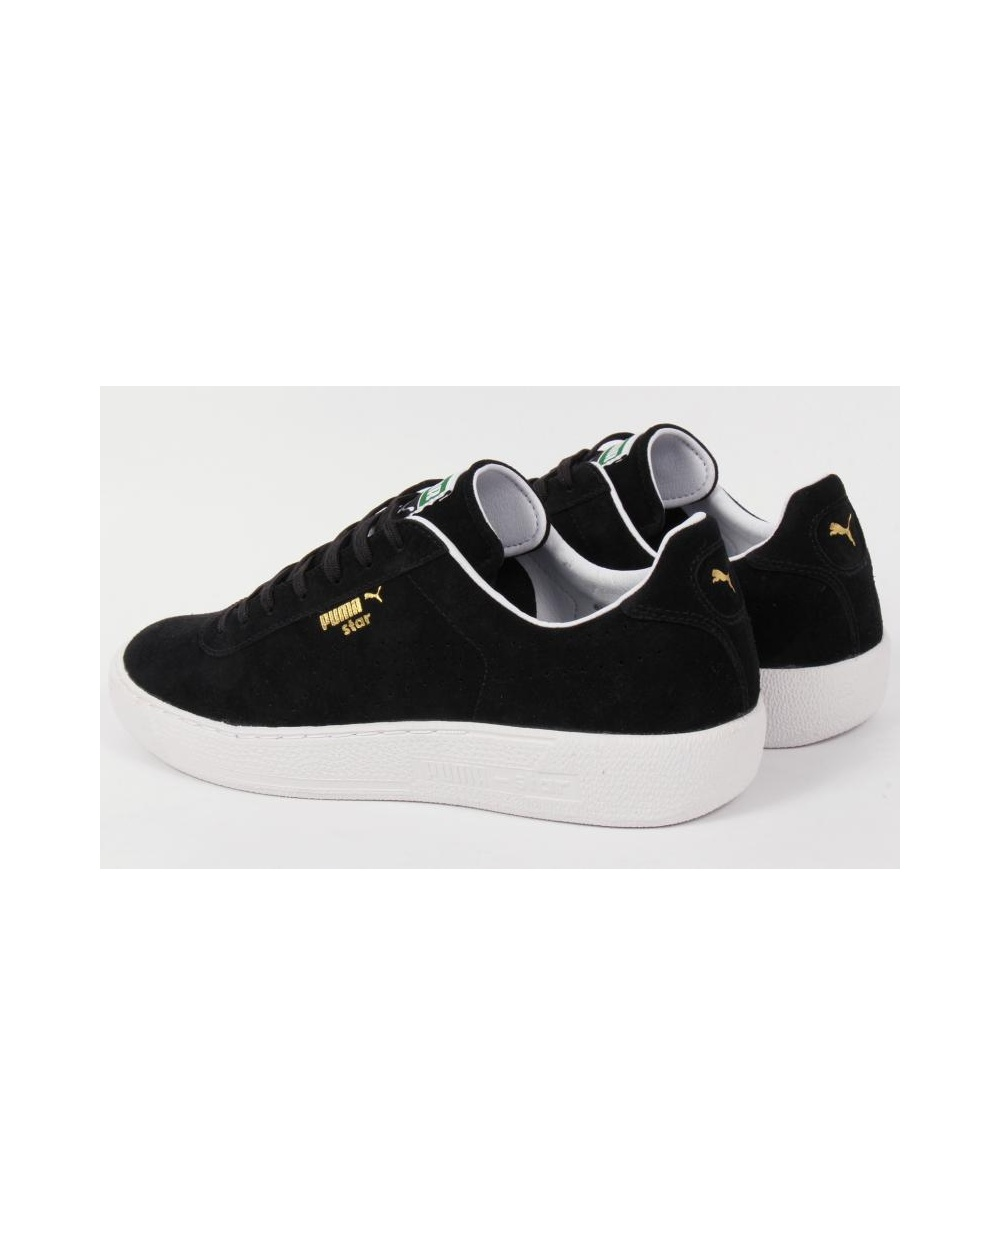 788e8b0f90e puma all black suede on sale   OFF62% Discounts